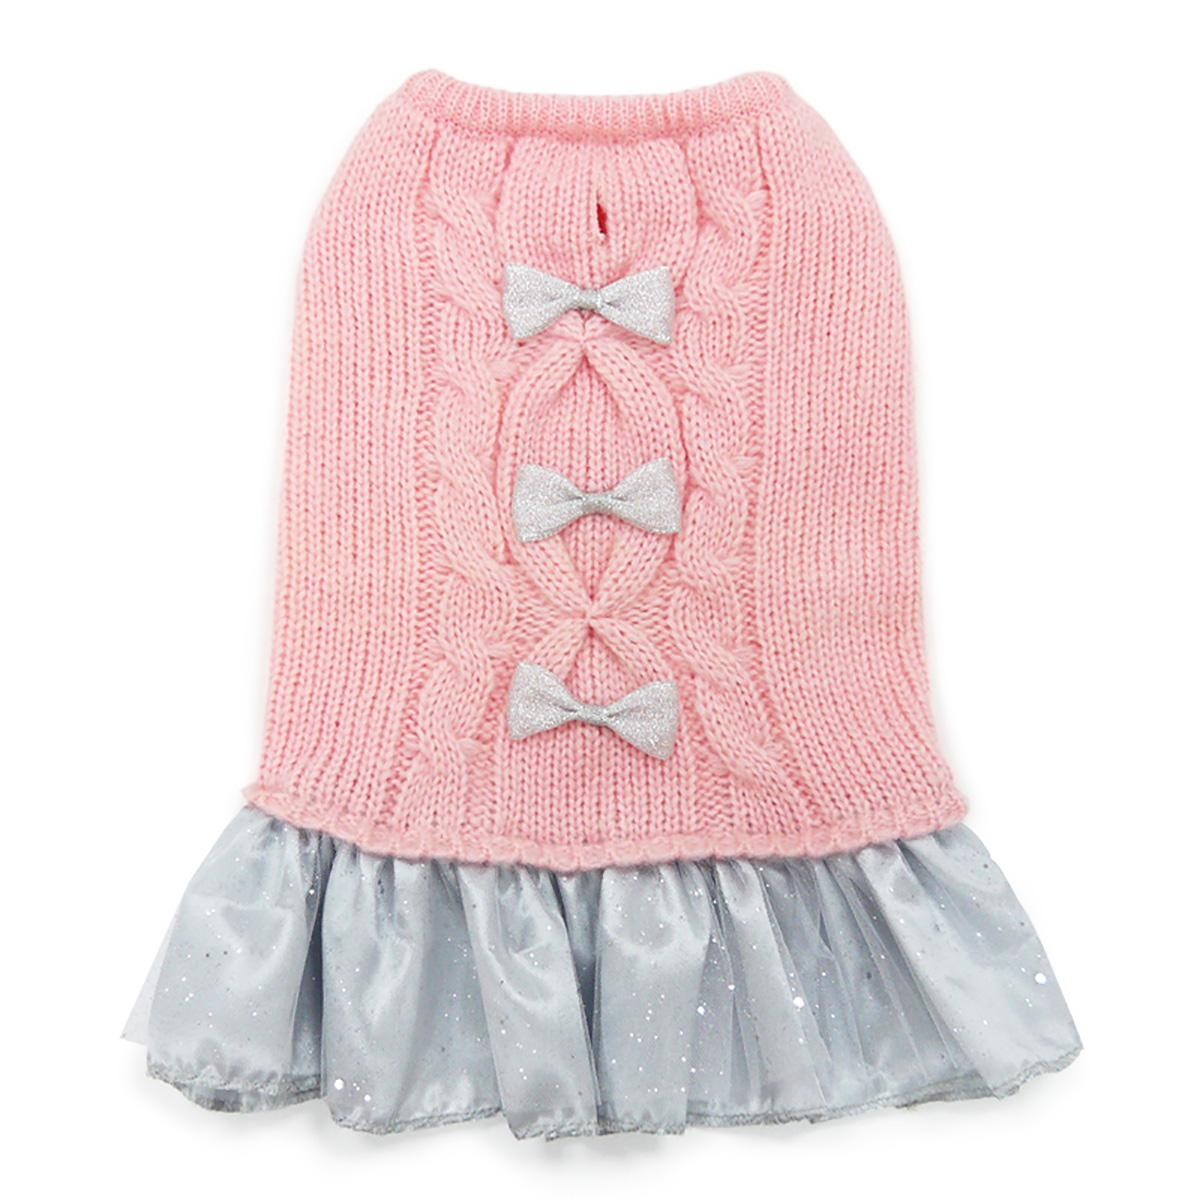 Party Princess Dog Dress by Dogo - Pink